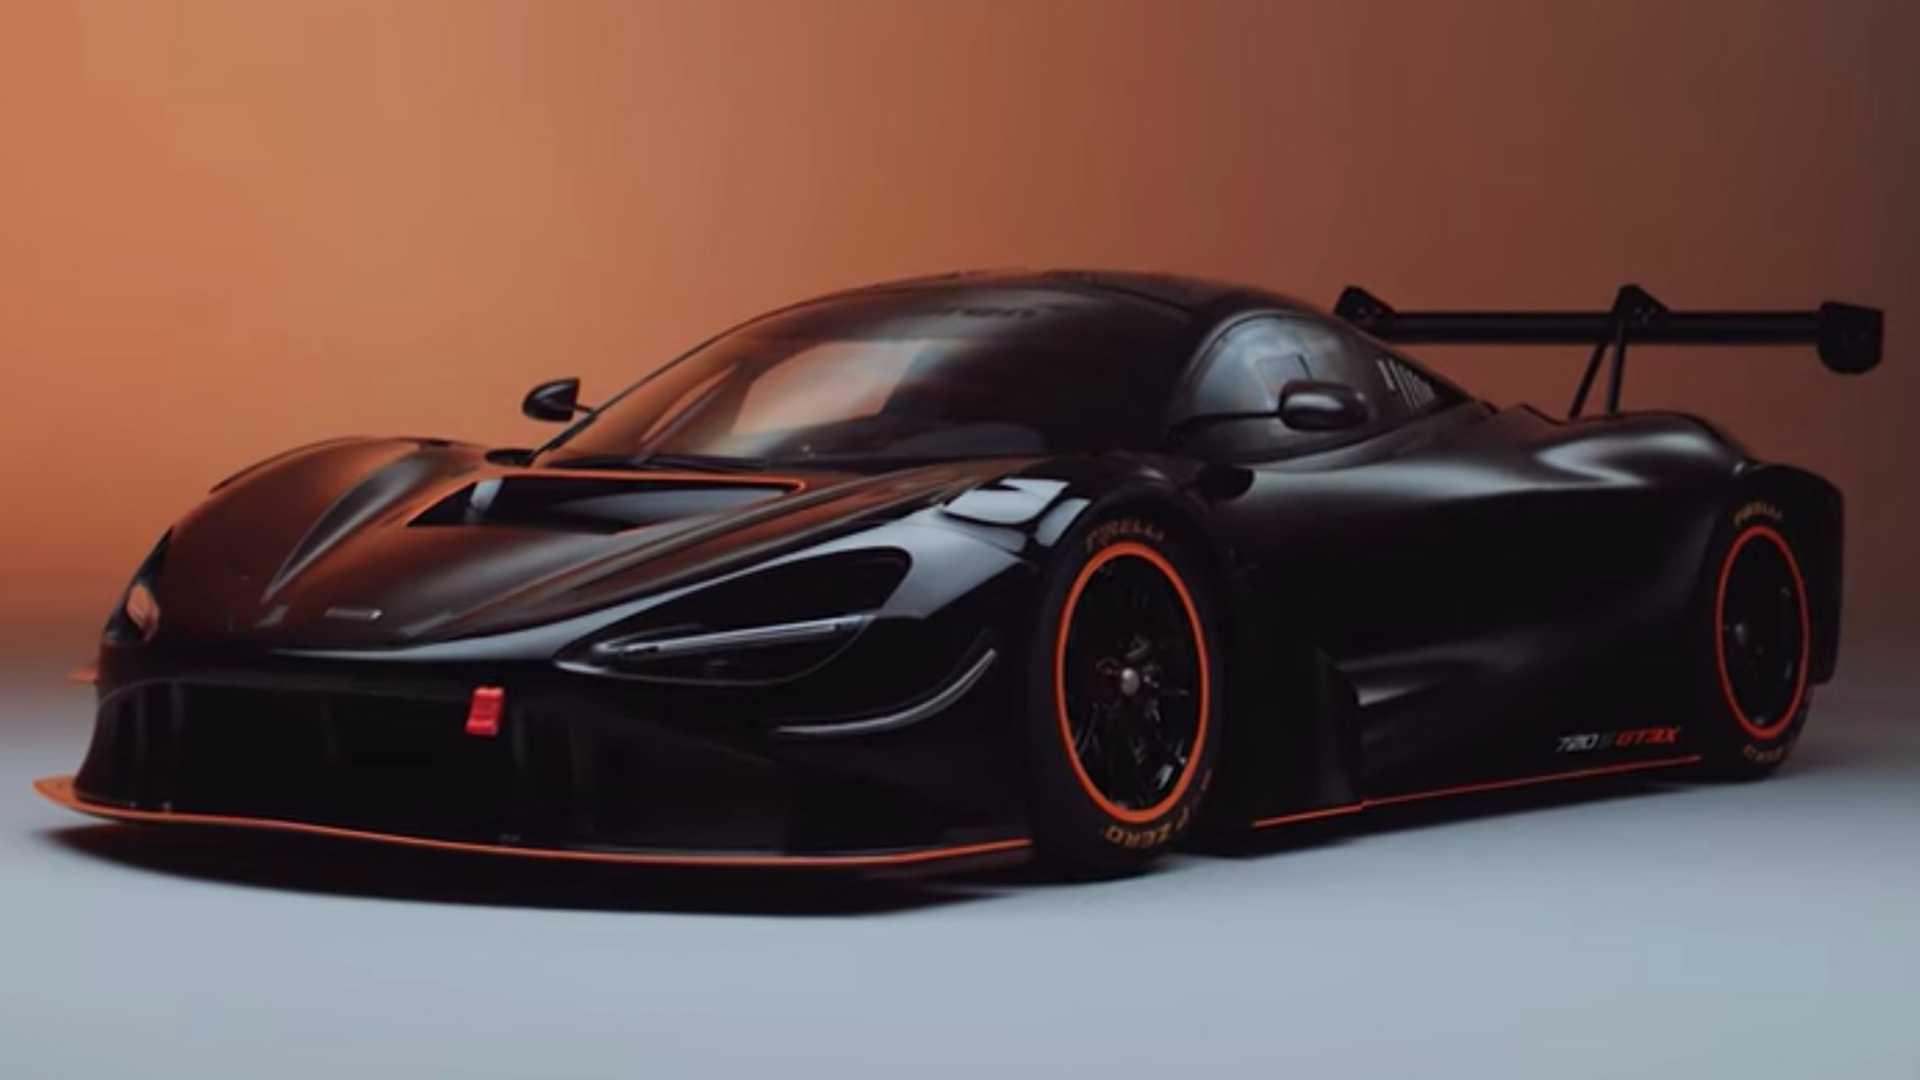 The McLaren 720S GT3X debuts by ignoring racing regulations with 710 hp